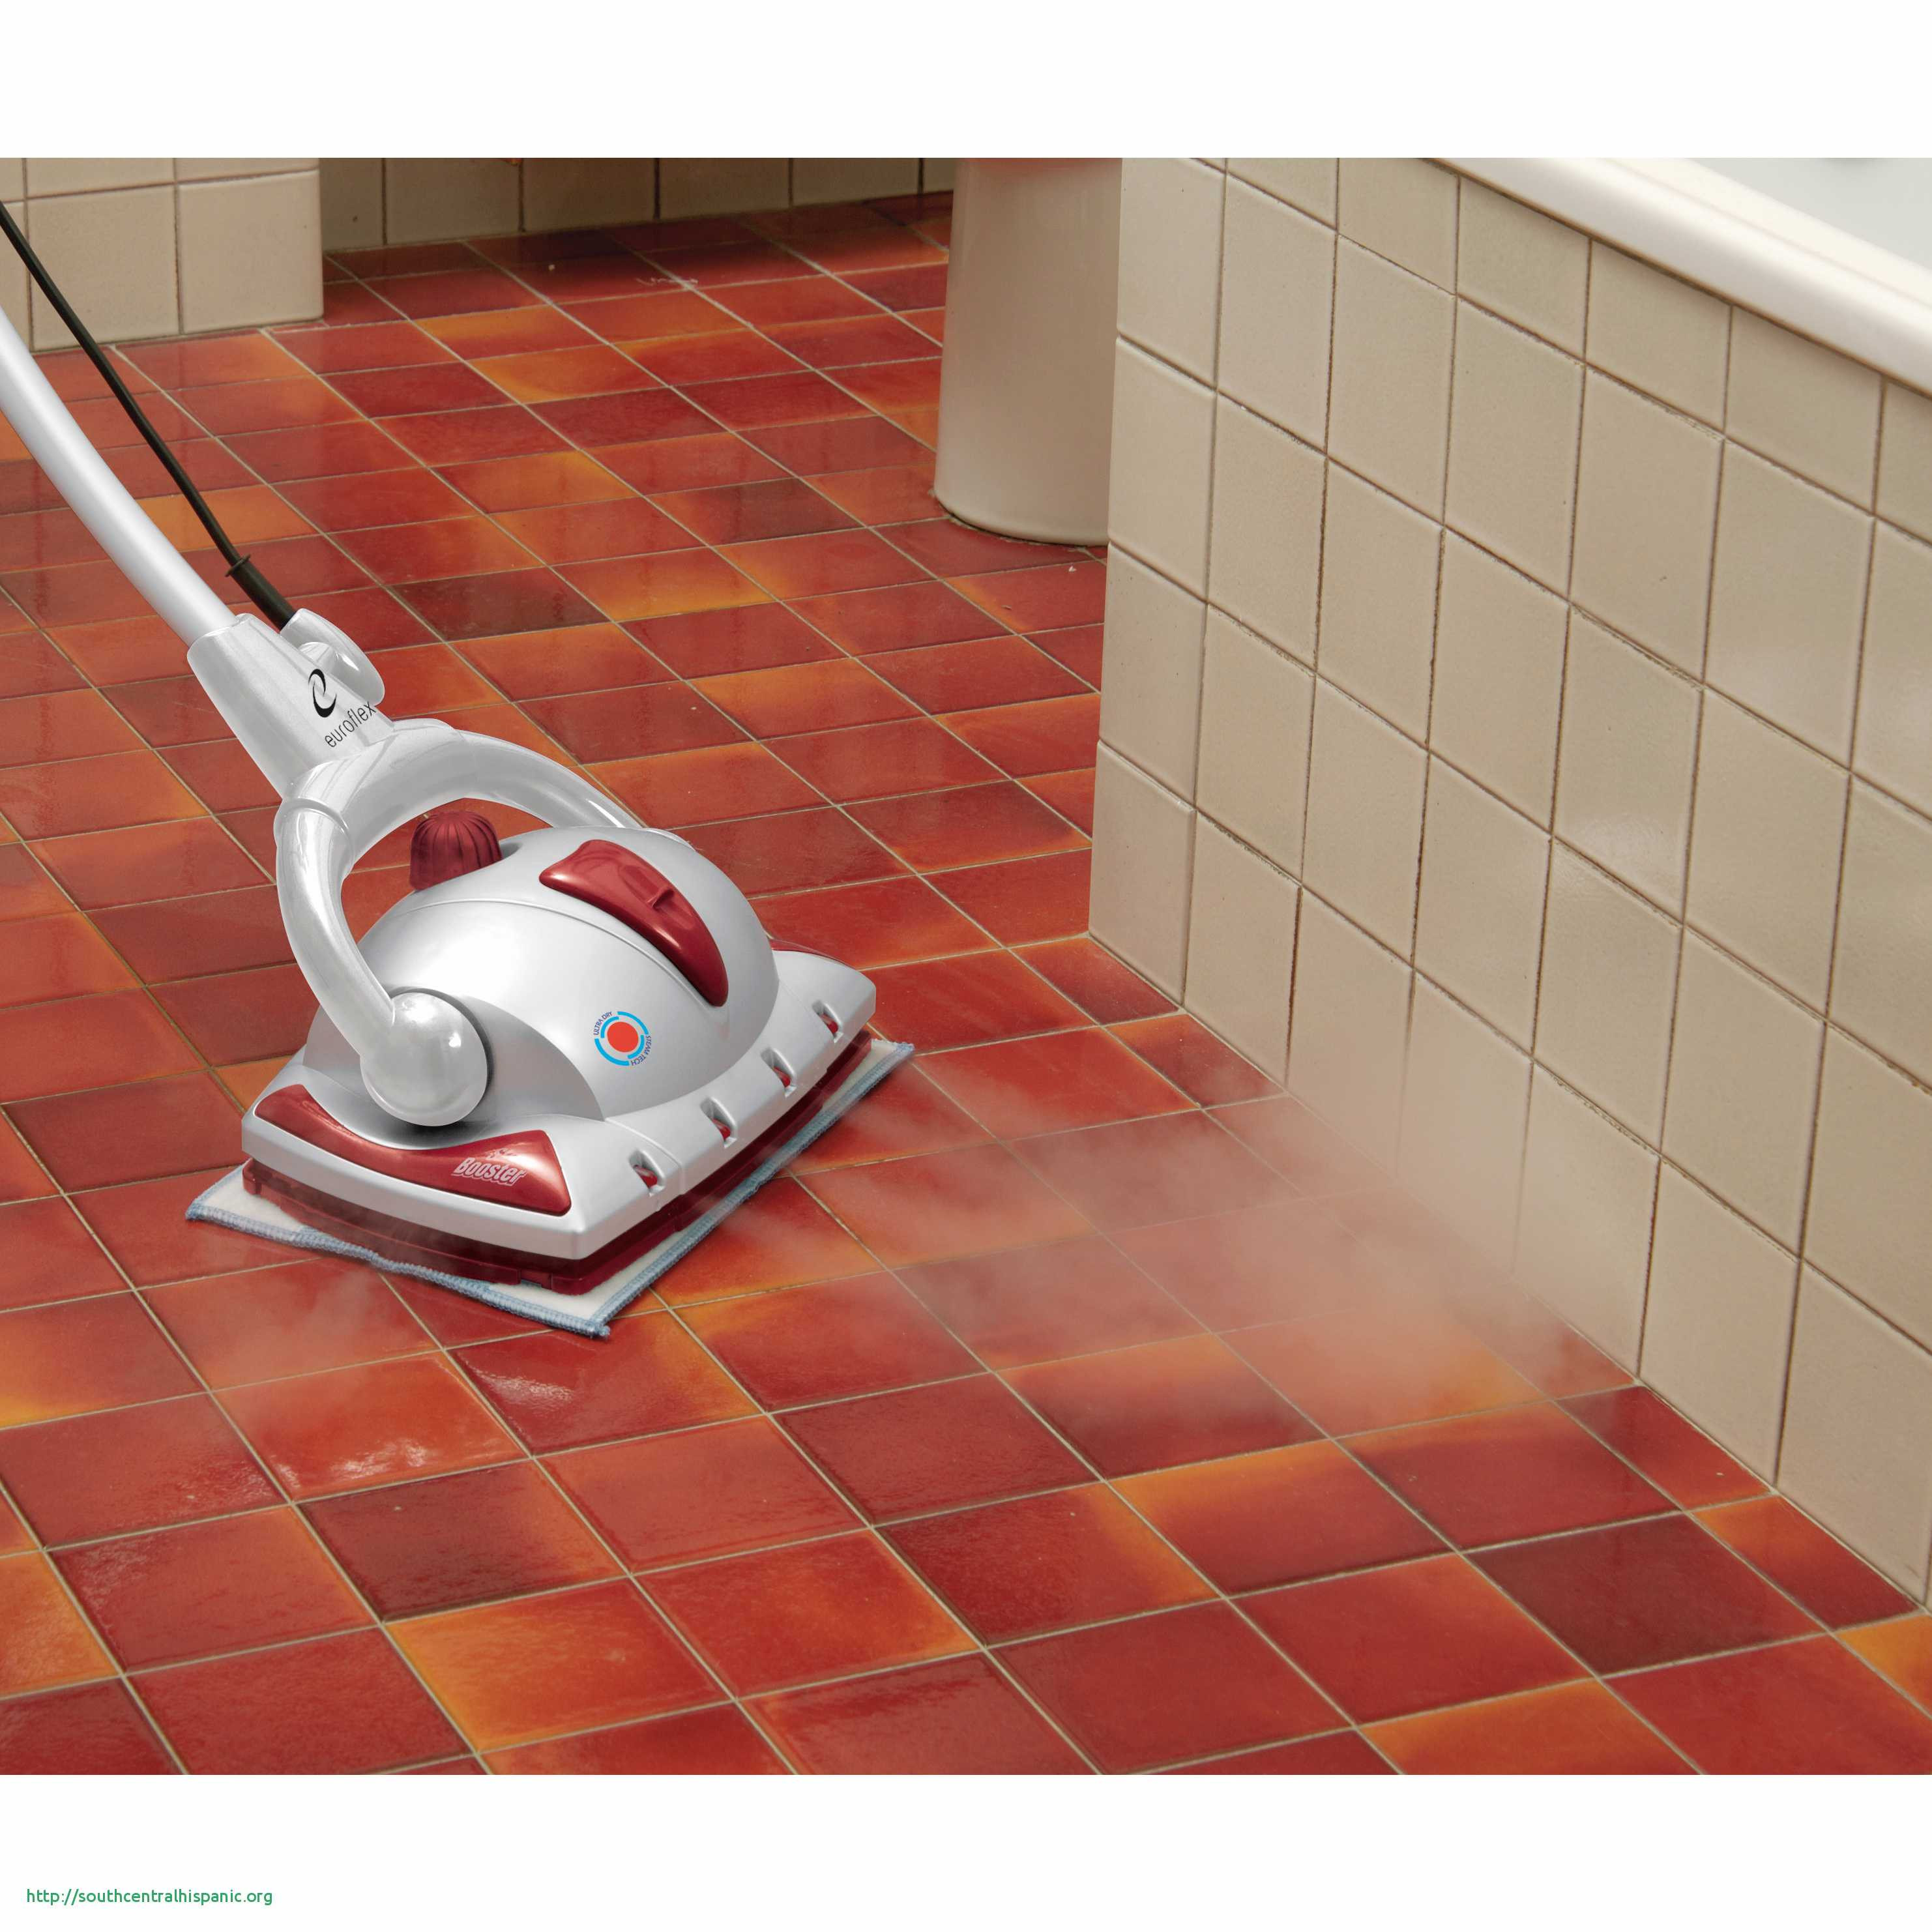 home depot hardwood floor cleaner rental of 15 luxe tile floor scrubber rental ideas blog in full size of floor tile floor steam cleaner steam carpet cleaner best floor steamer for